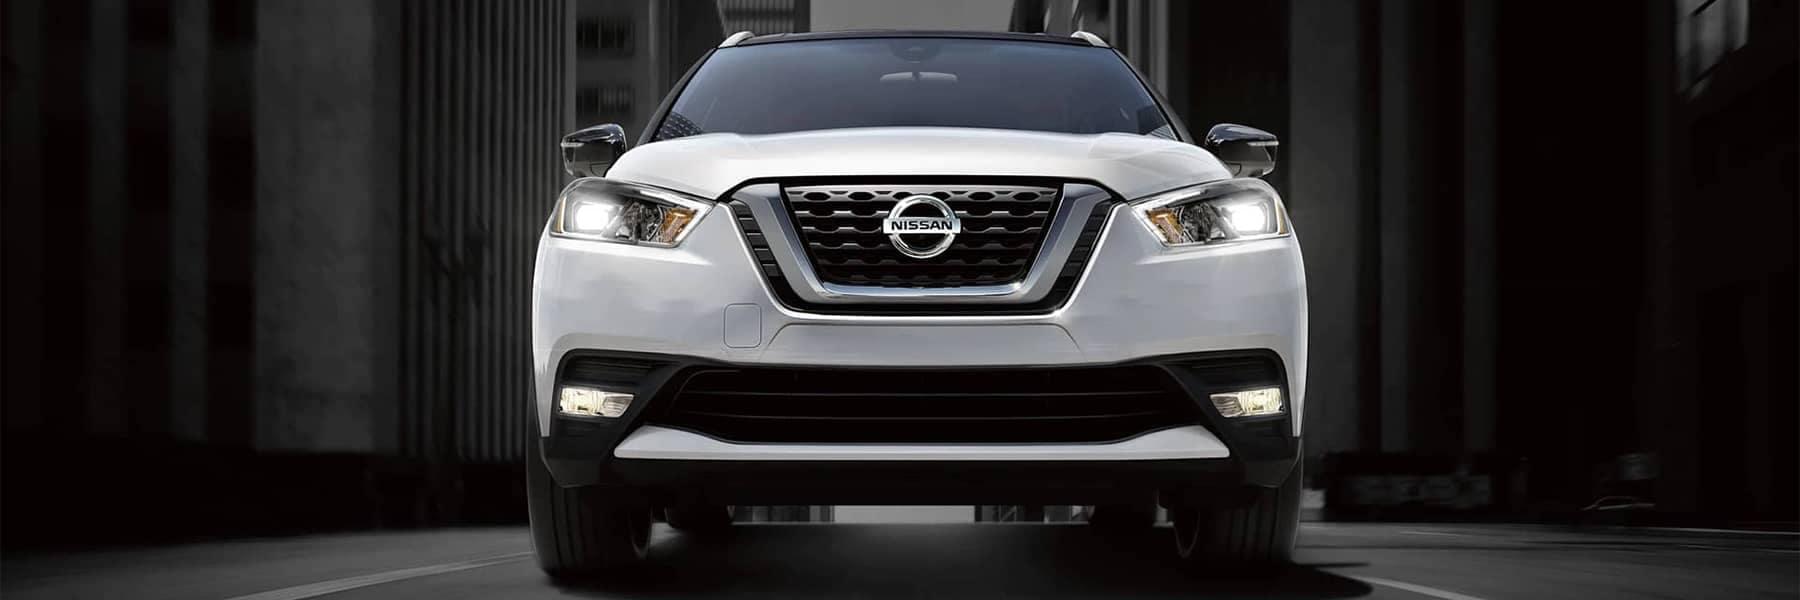 2020 Nissan Kicks Exterior Grille Front View